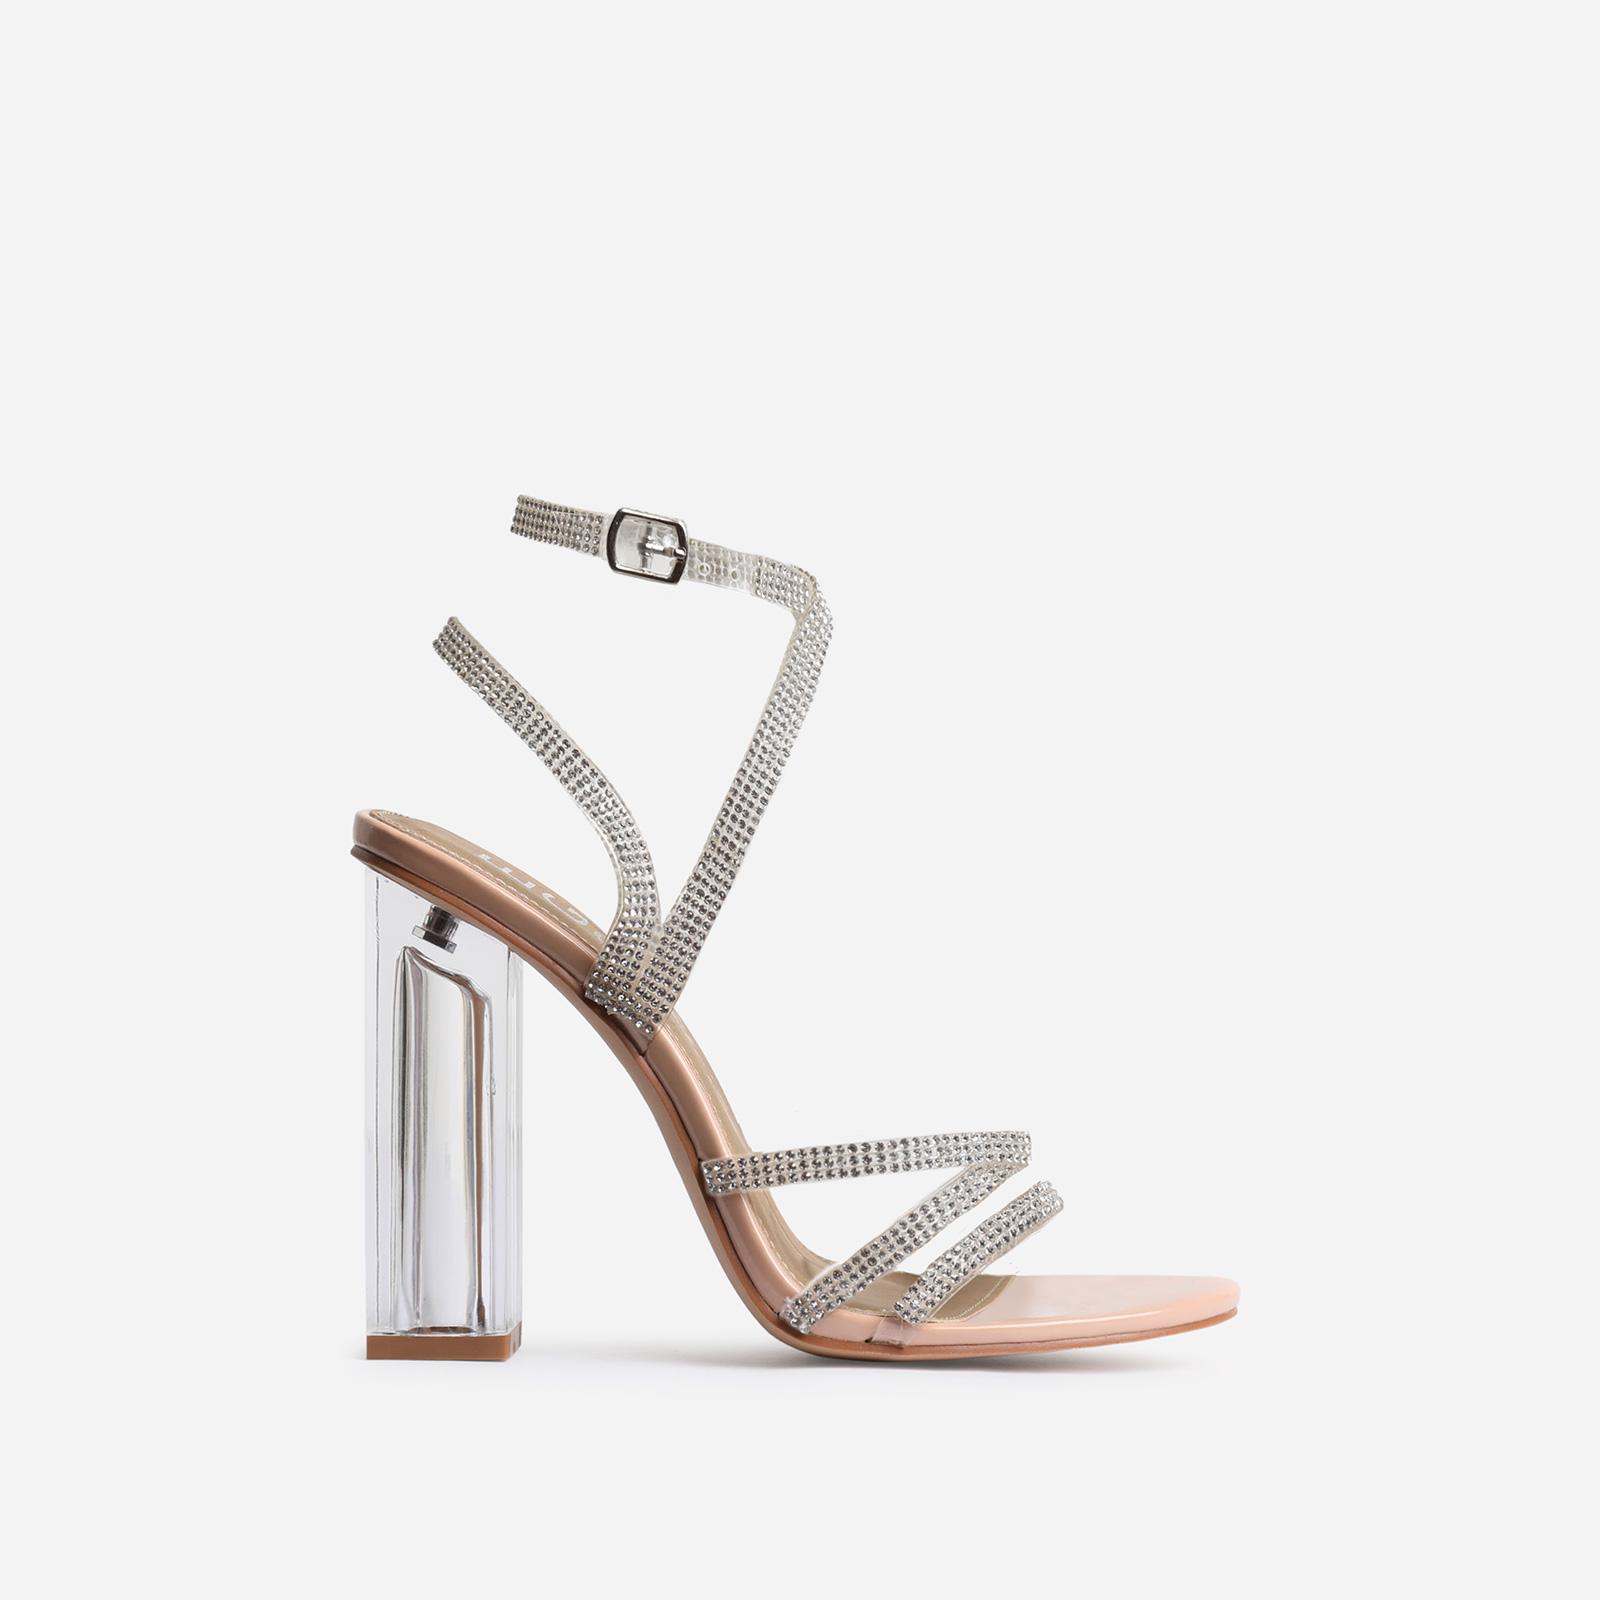 Dash Diamante Detail Clear Perspex Block Heel In Nude Patent